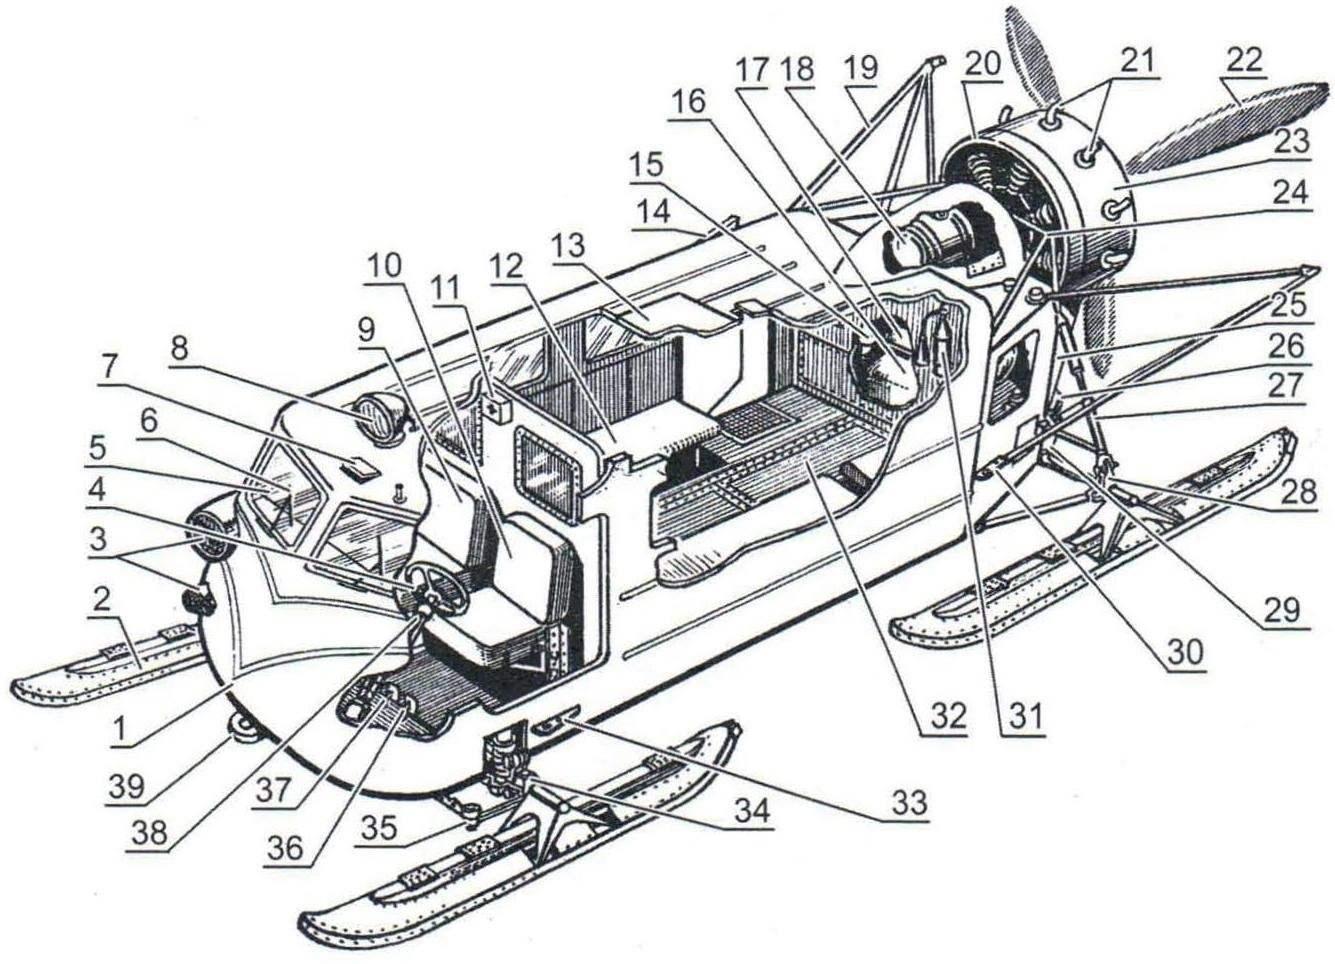 Компоновка аэросаней Ка-30